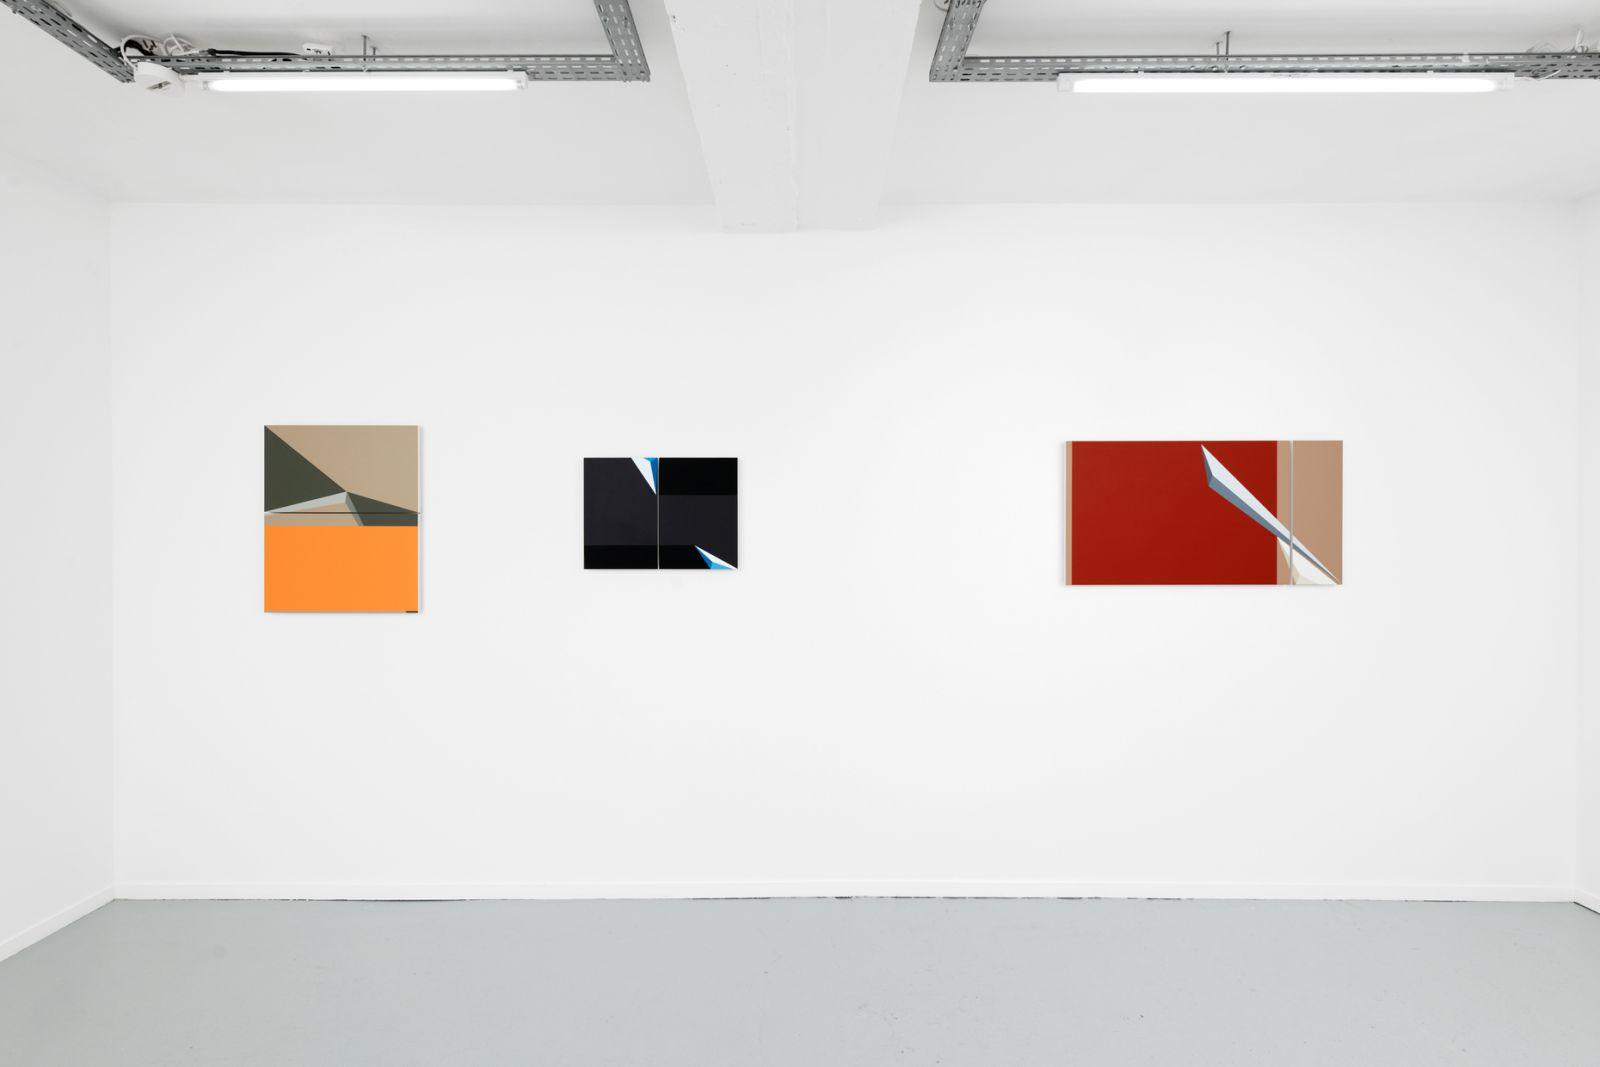 02-parties-fines-progress-gallery-vue-expo-1-aurelien-mole-web-0bcfbe9f5c25be80fba04bd2fc3746c8